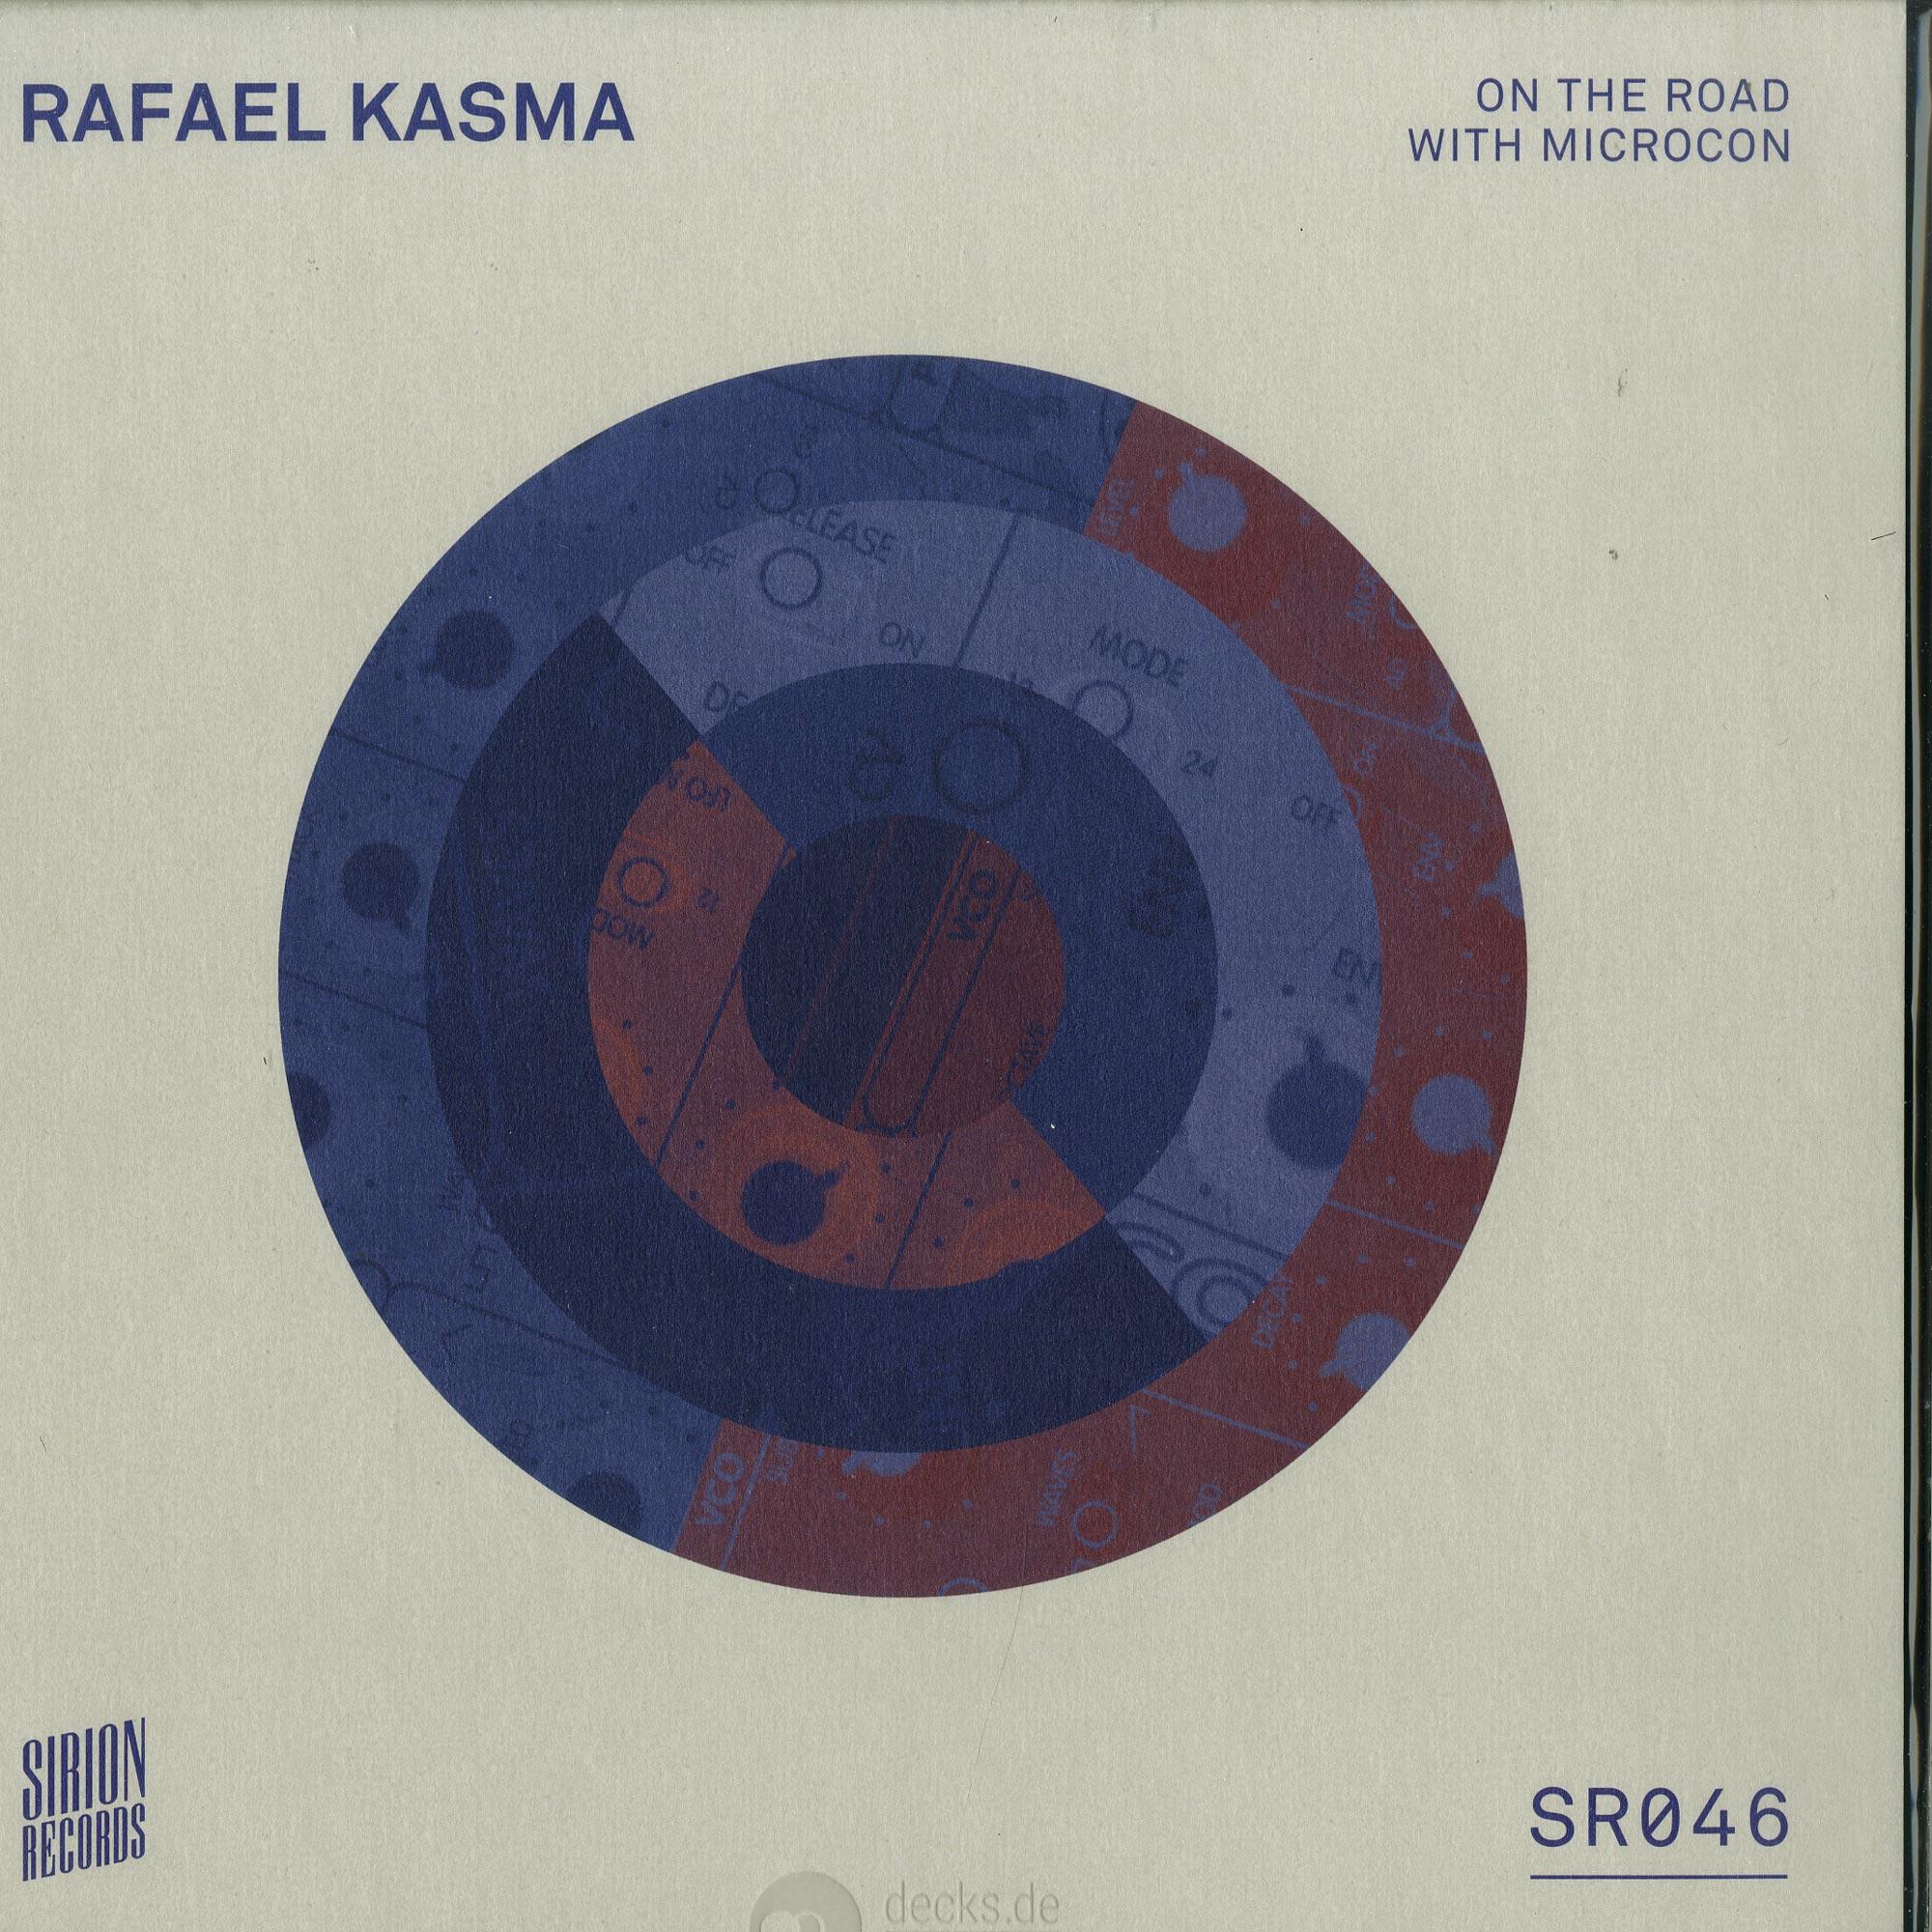 Rafael Kasma - ON THE ROAD WITH MICRON